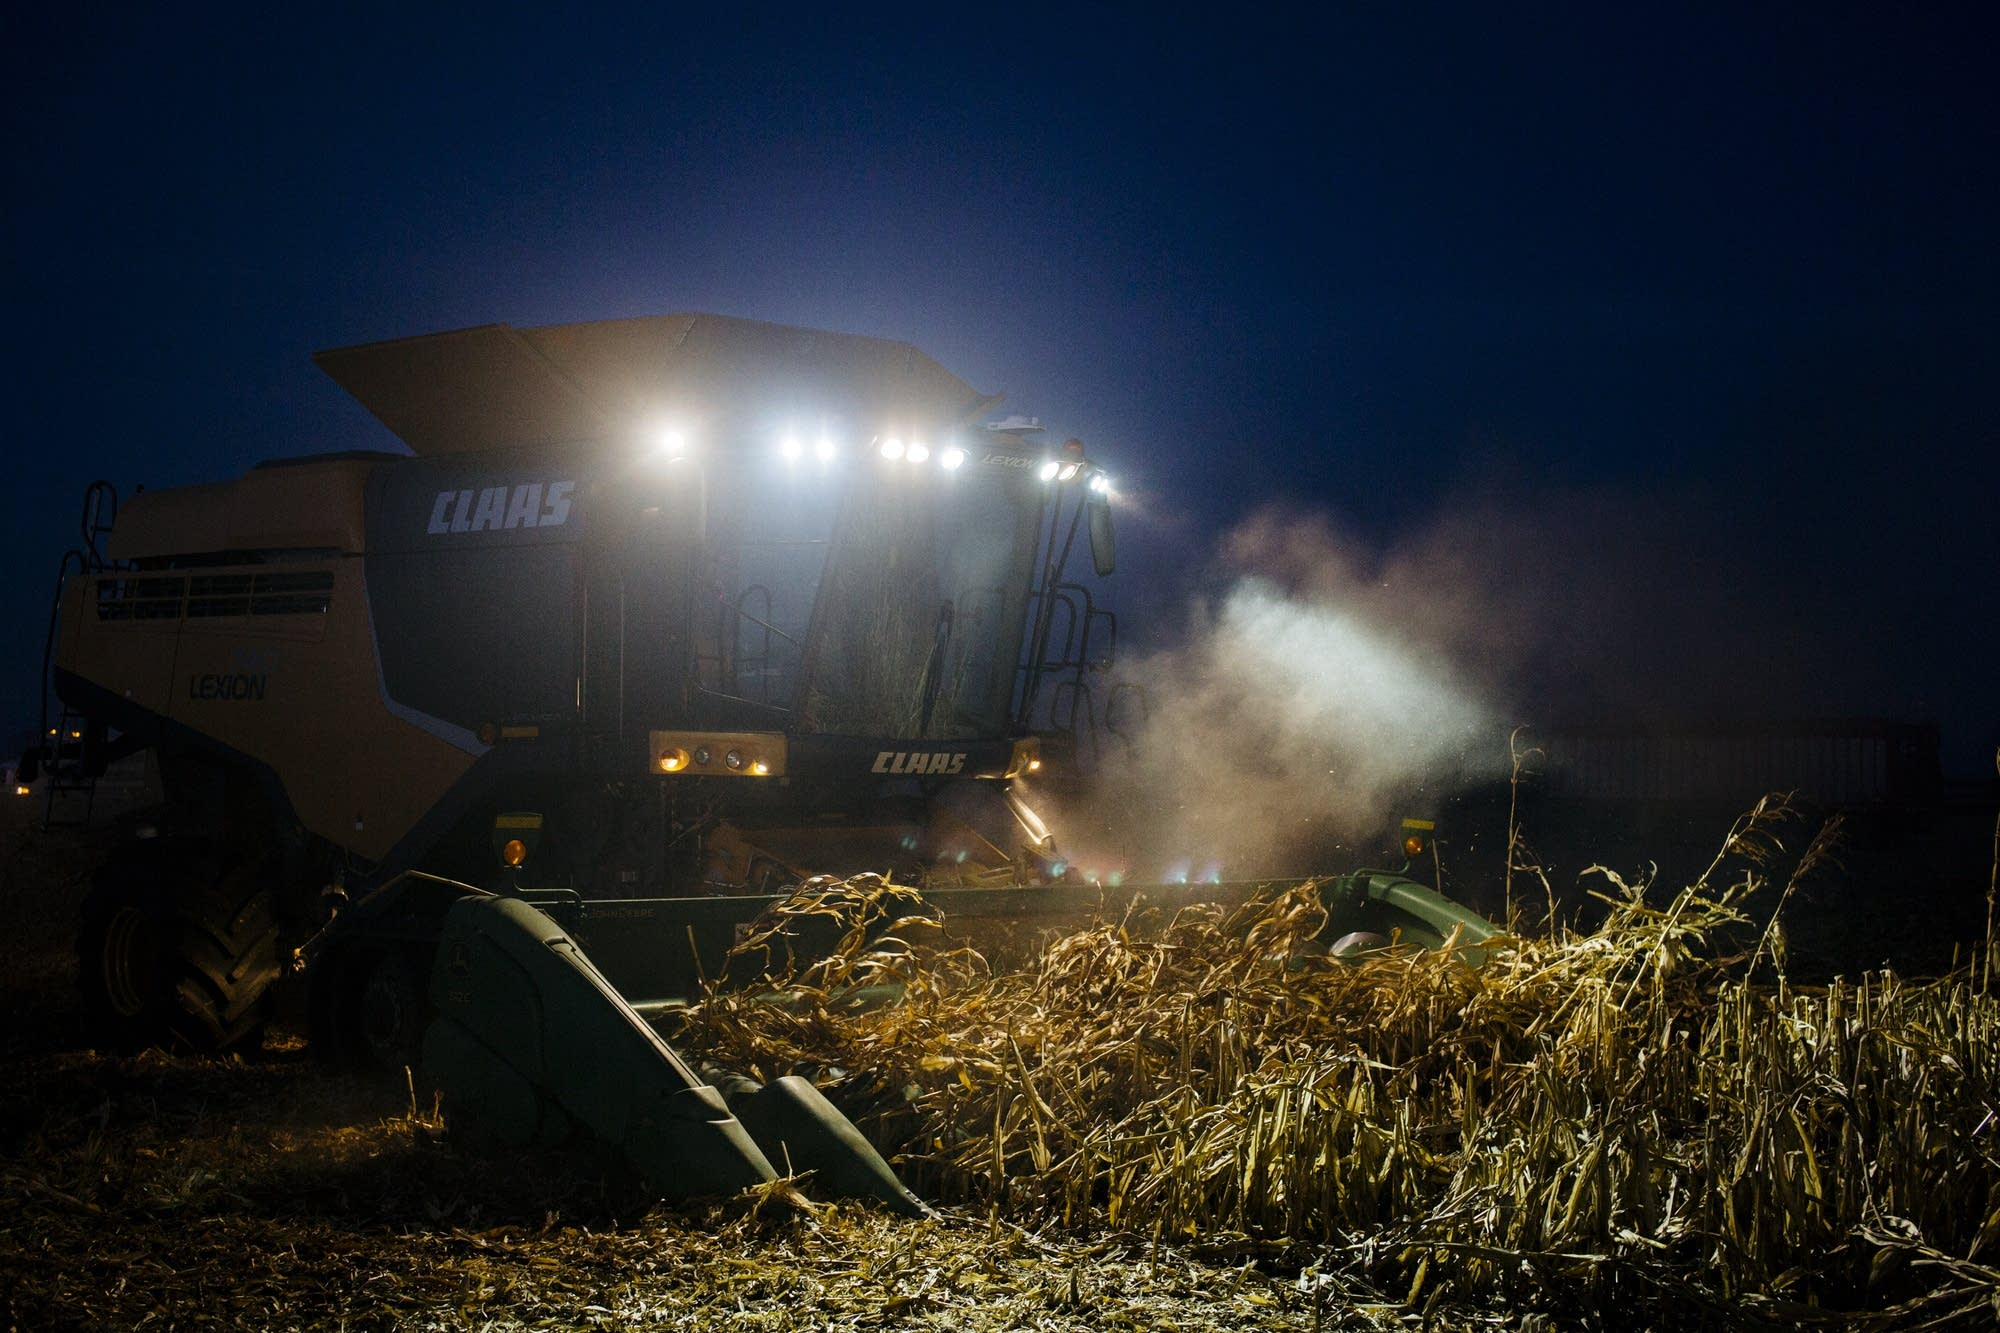 The combine lights up corn debris.